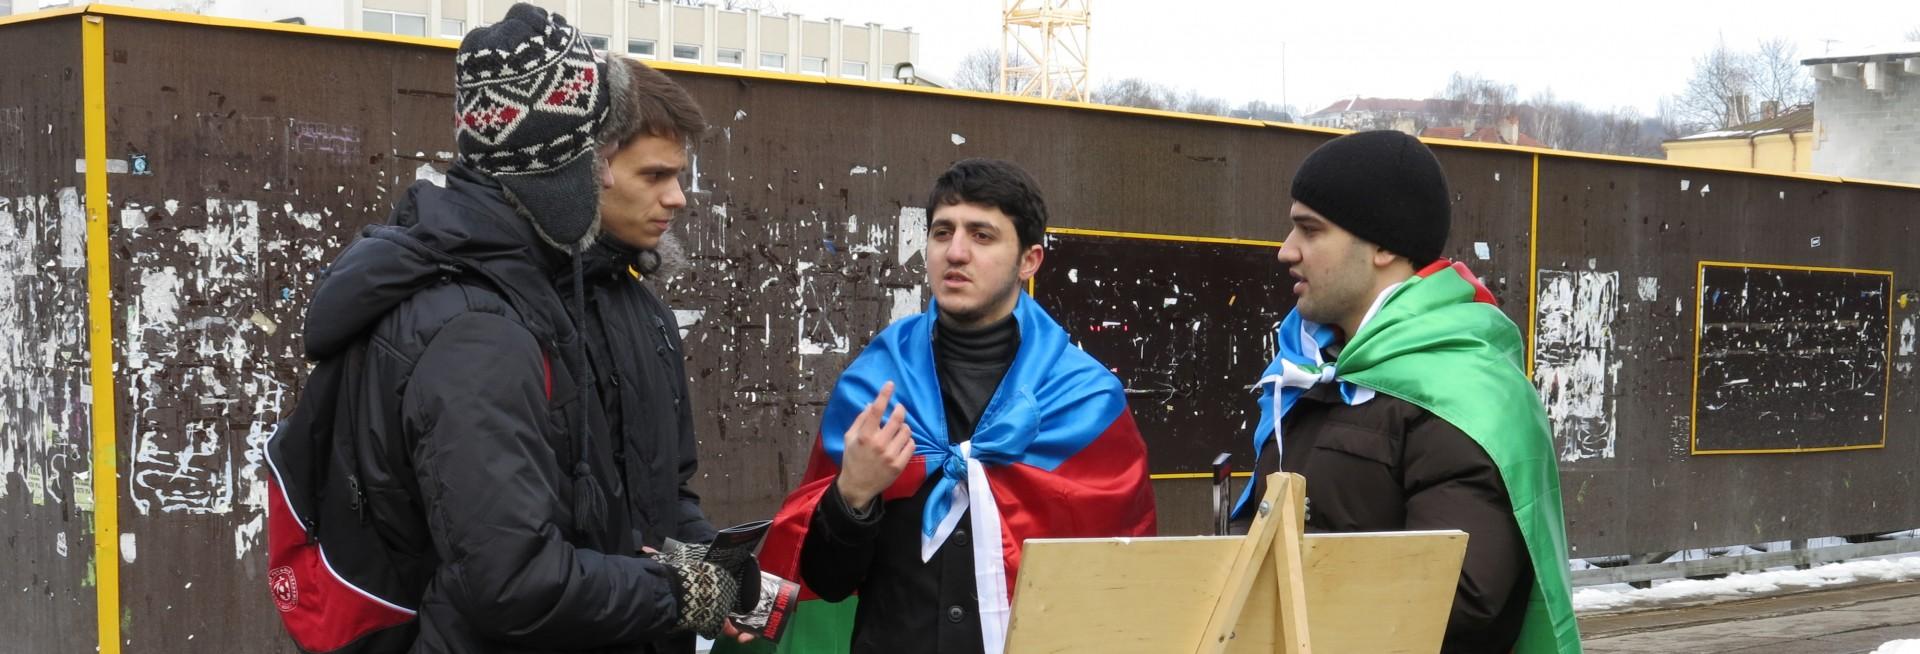 armenian assistance essay article 2013